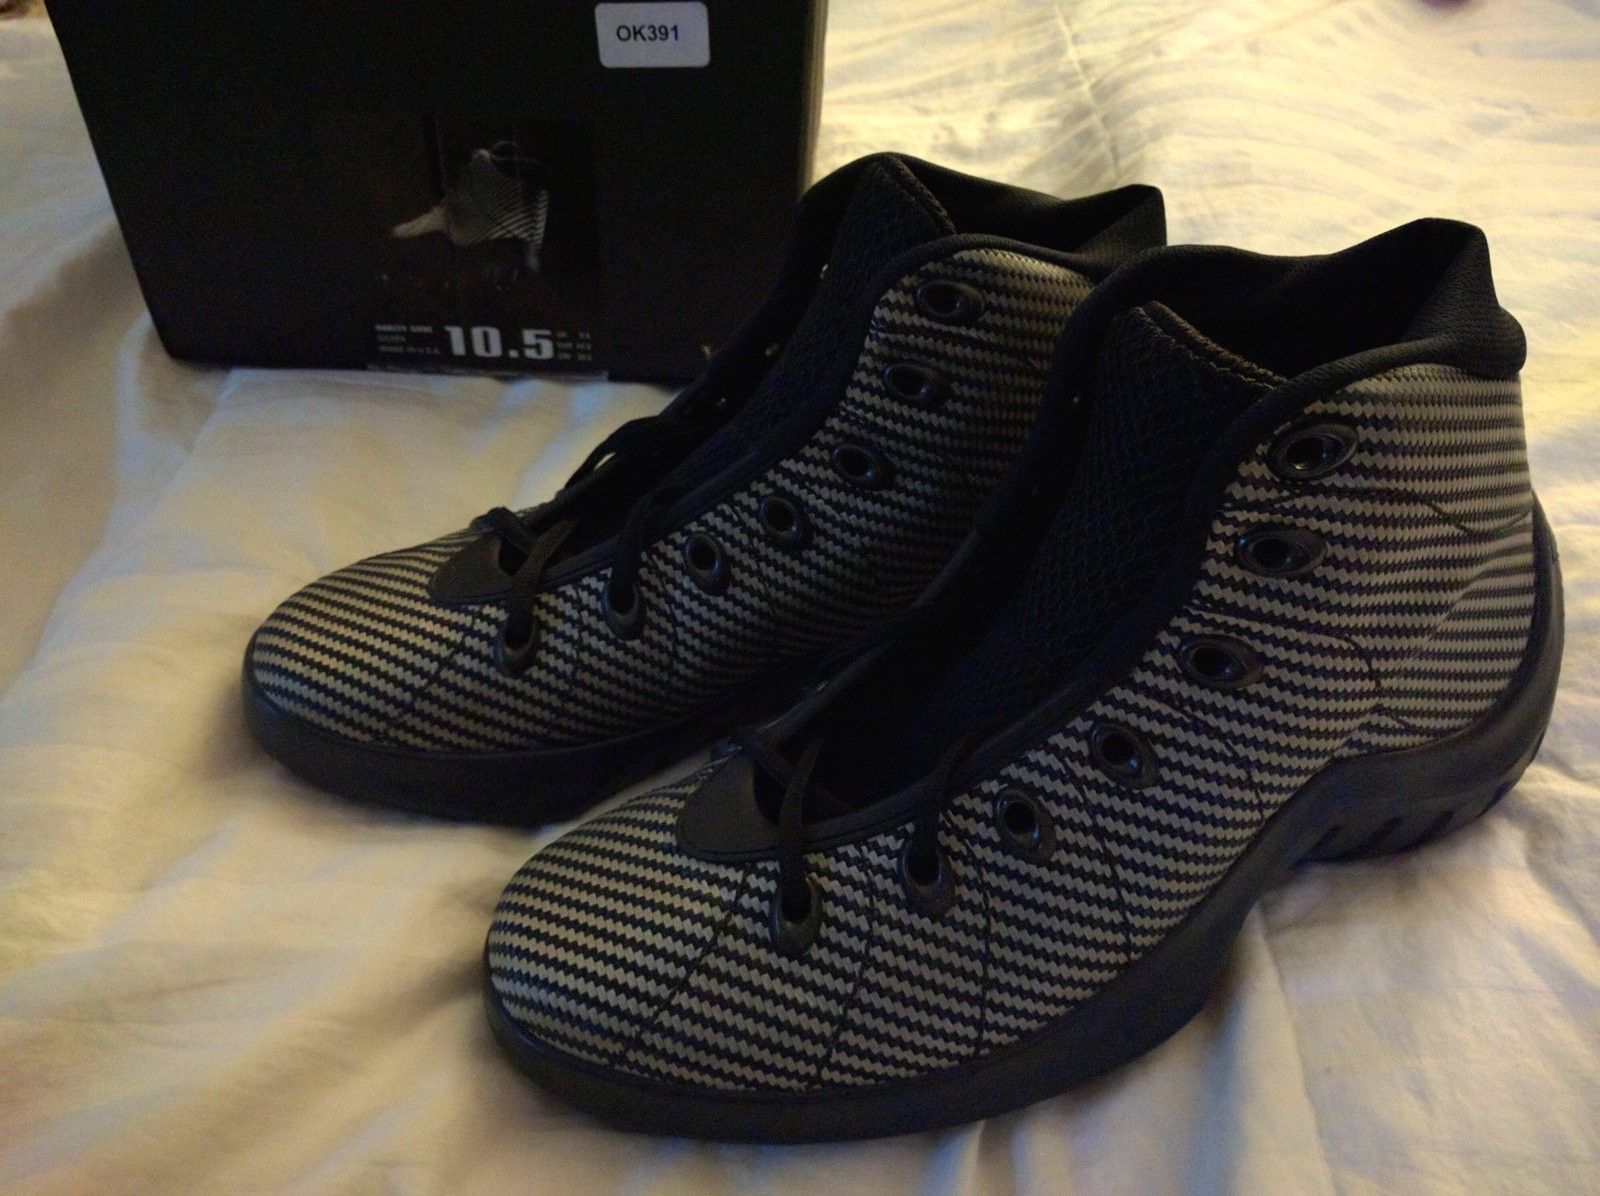 Shoe One(s) - Shoe One Grey Hightop.jpg